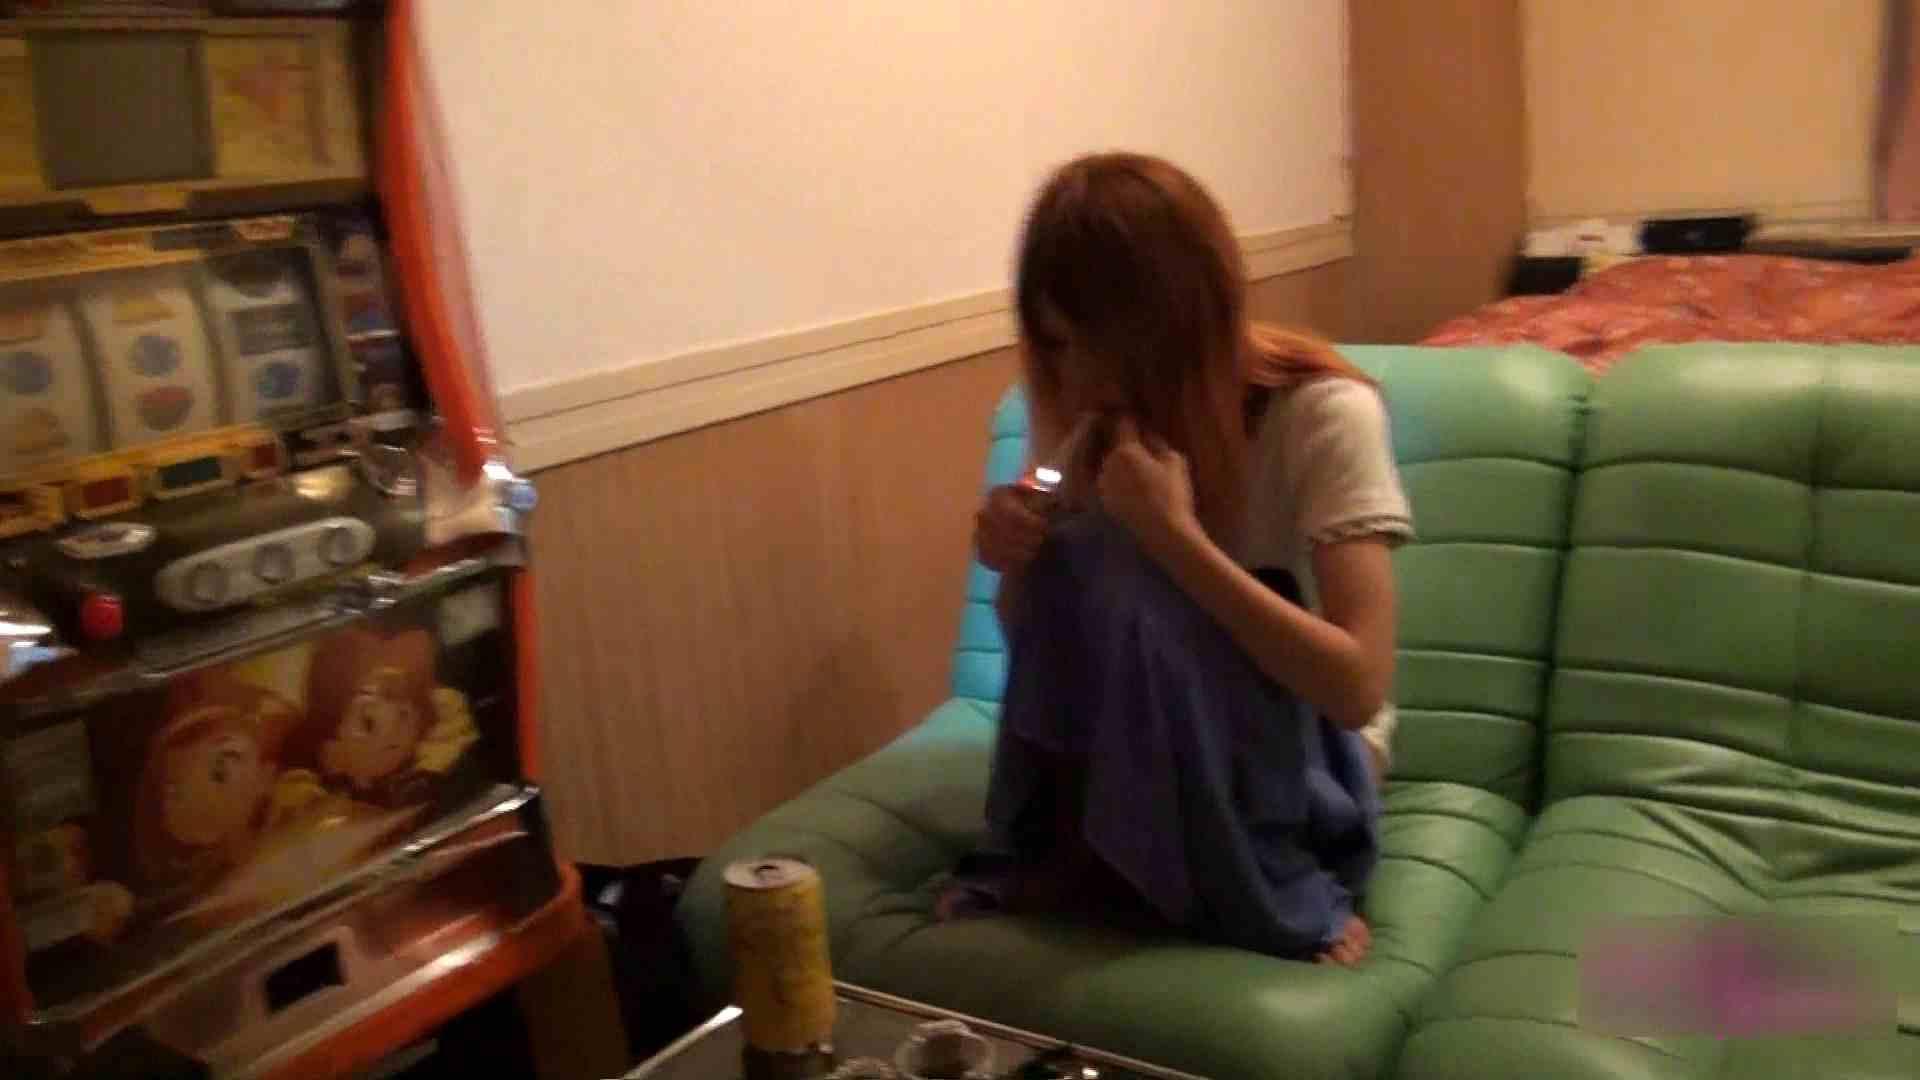 S級厳選美女ビッチガールVol.01 美女丸裸   美しいOLの裸体  87pic 22